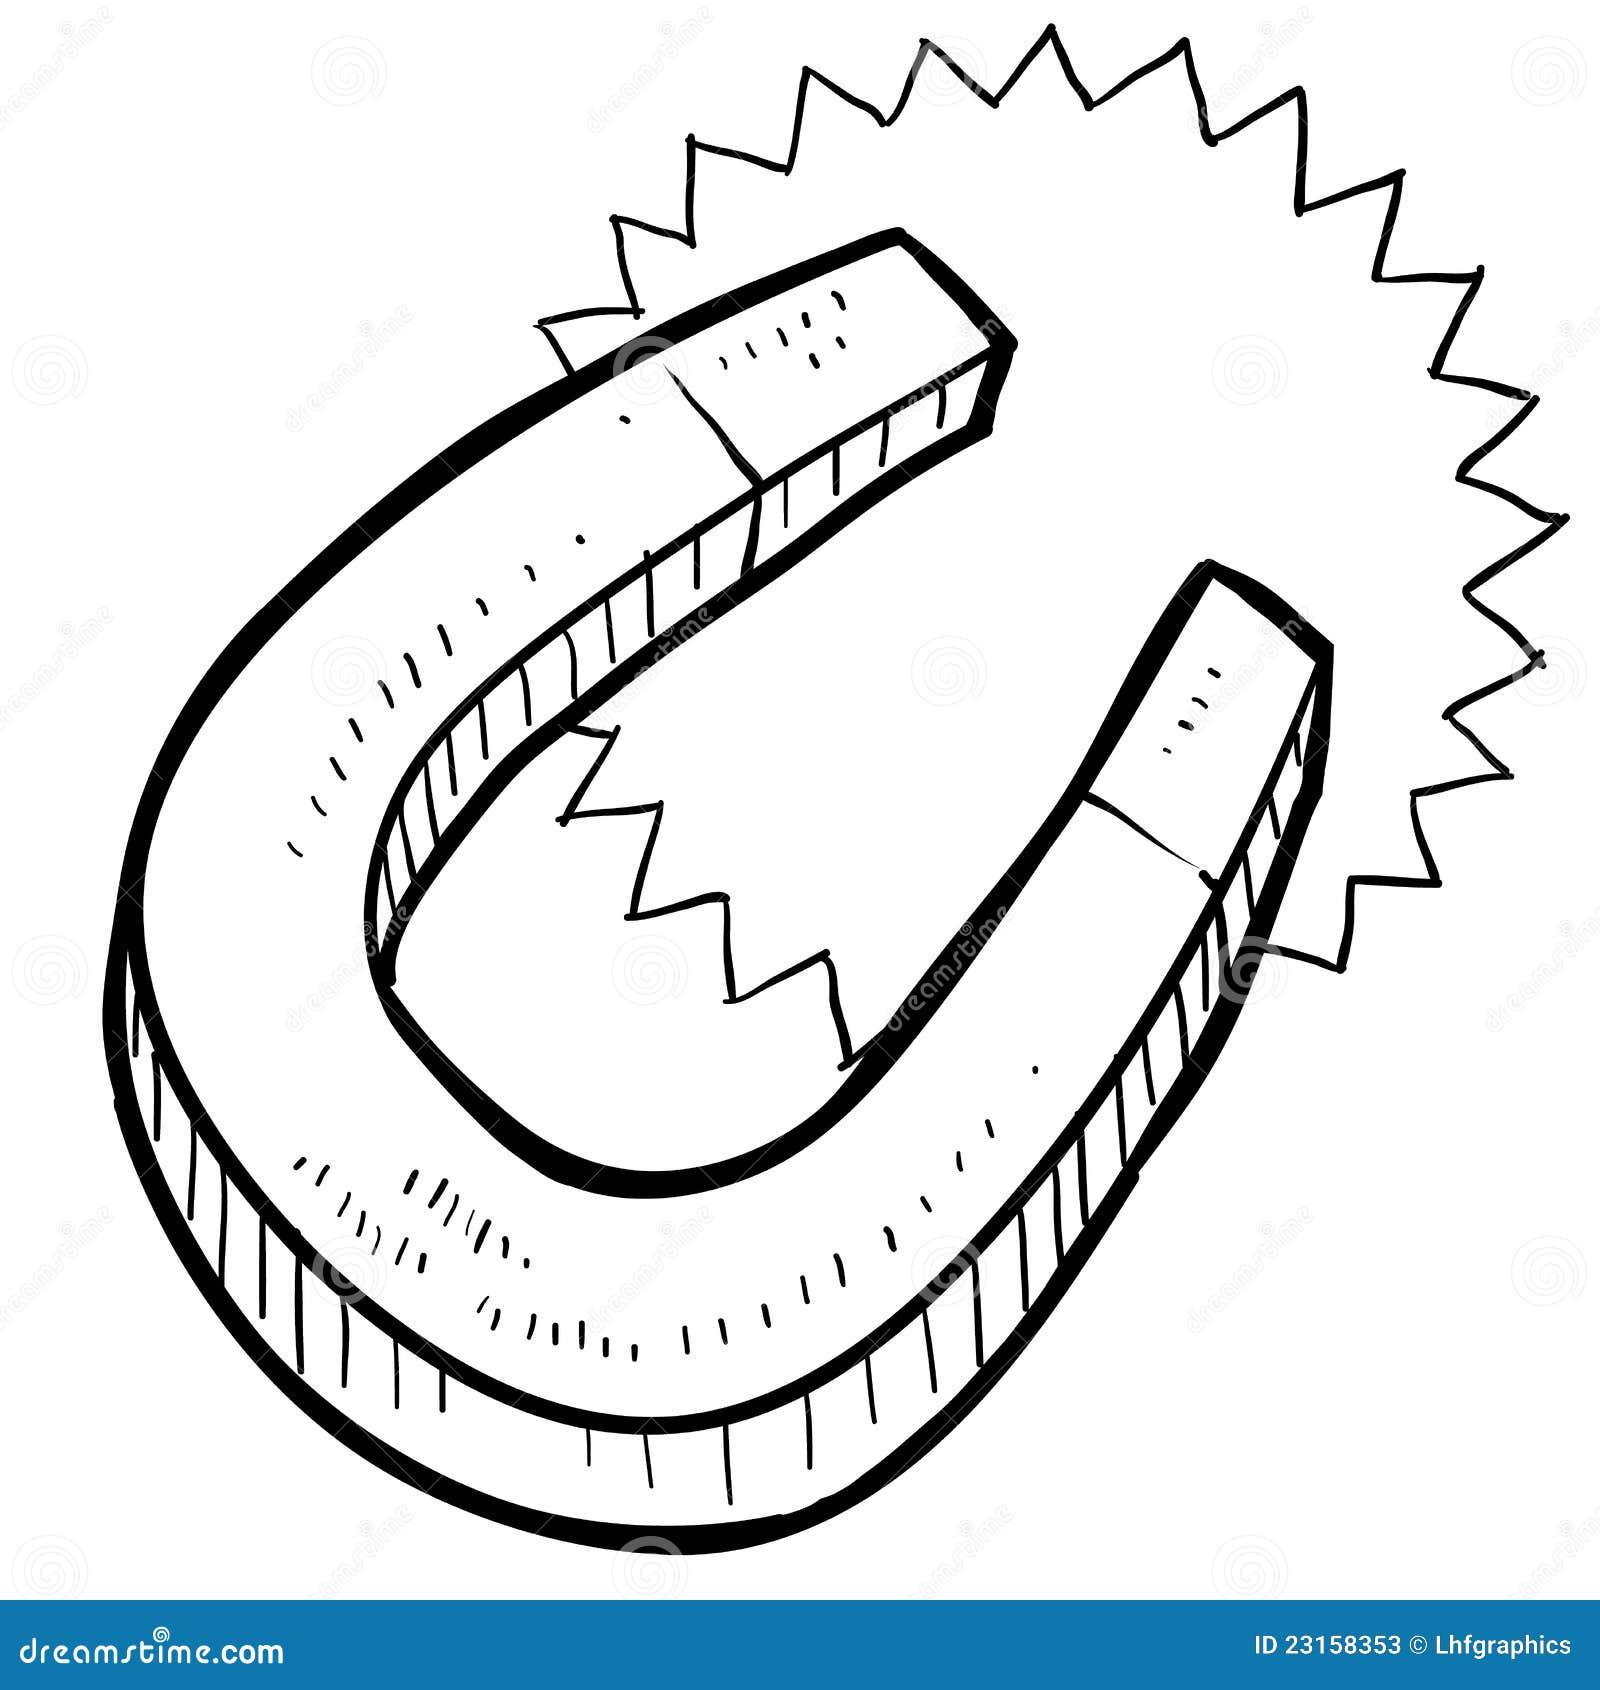 Horseshoe Magnet Sketch Stock Vector Illustration Of